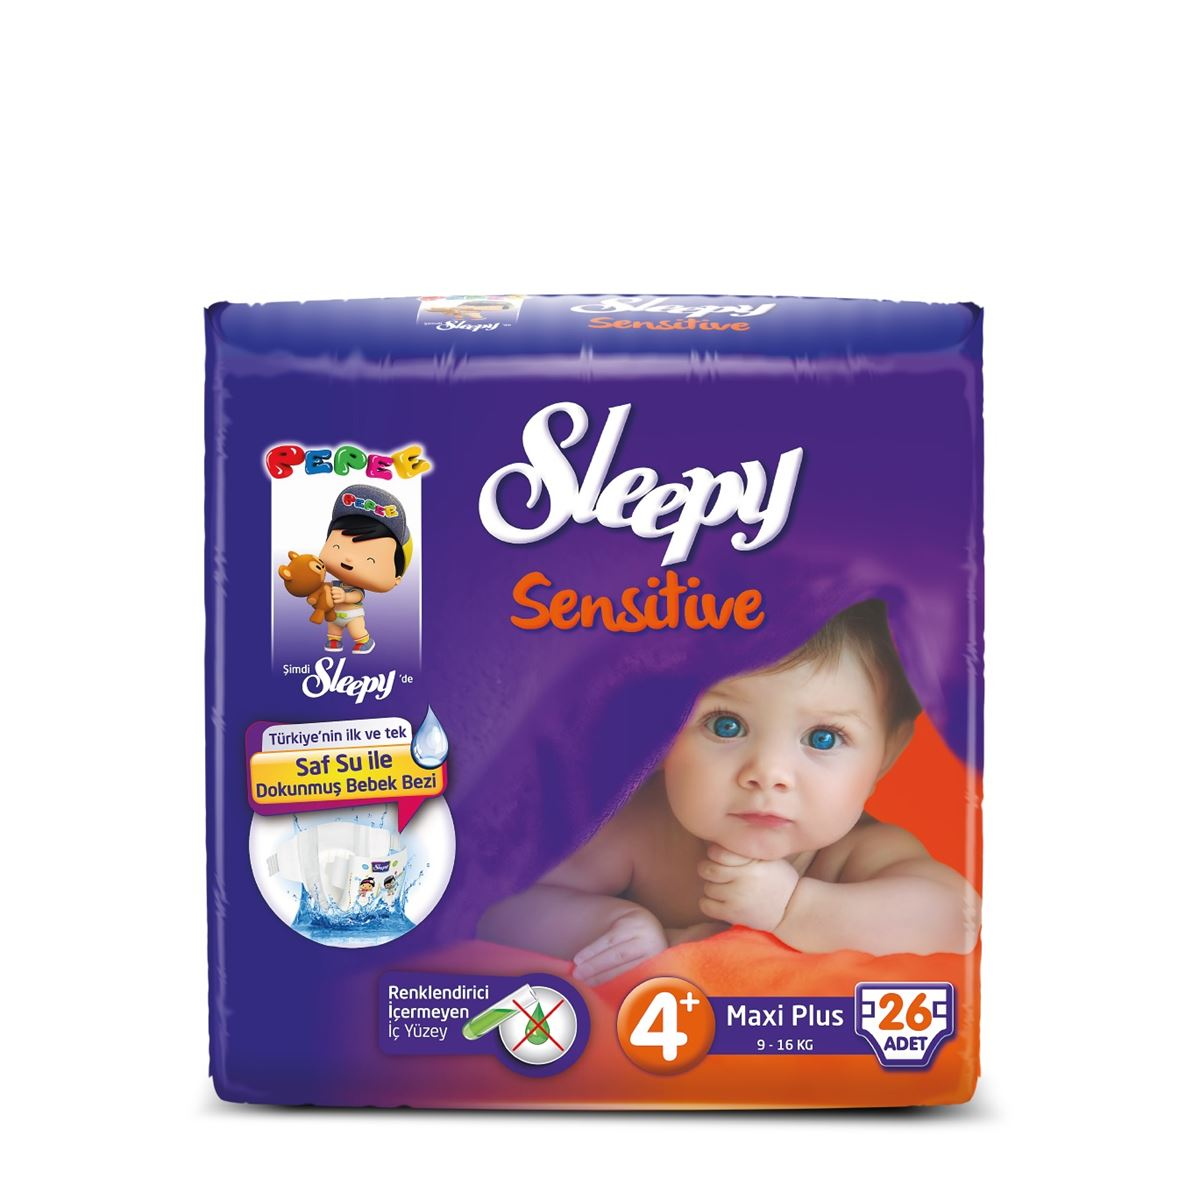 Sleepy Sensitive Pepee Maxi Plus 4+ Numara Bebek Bezi